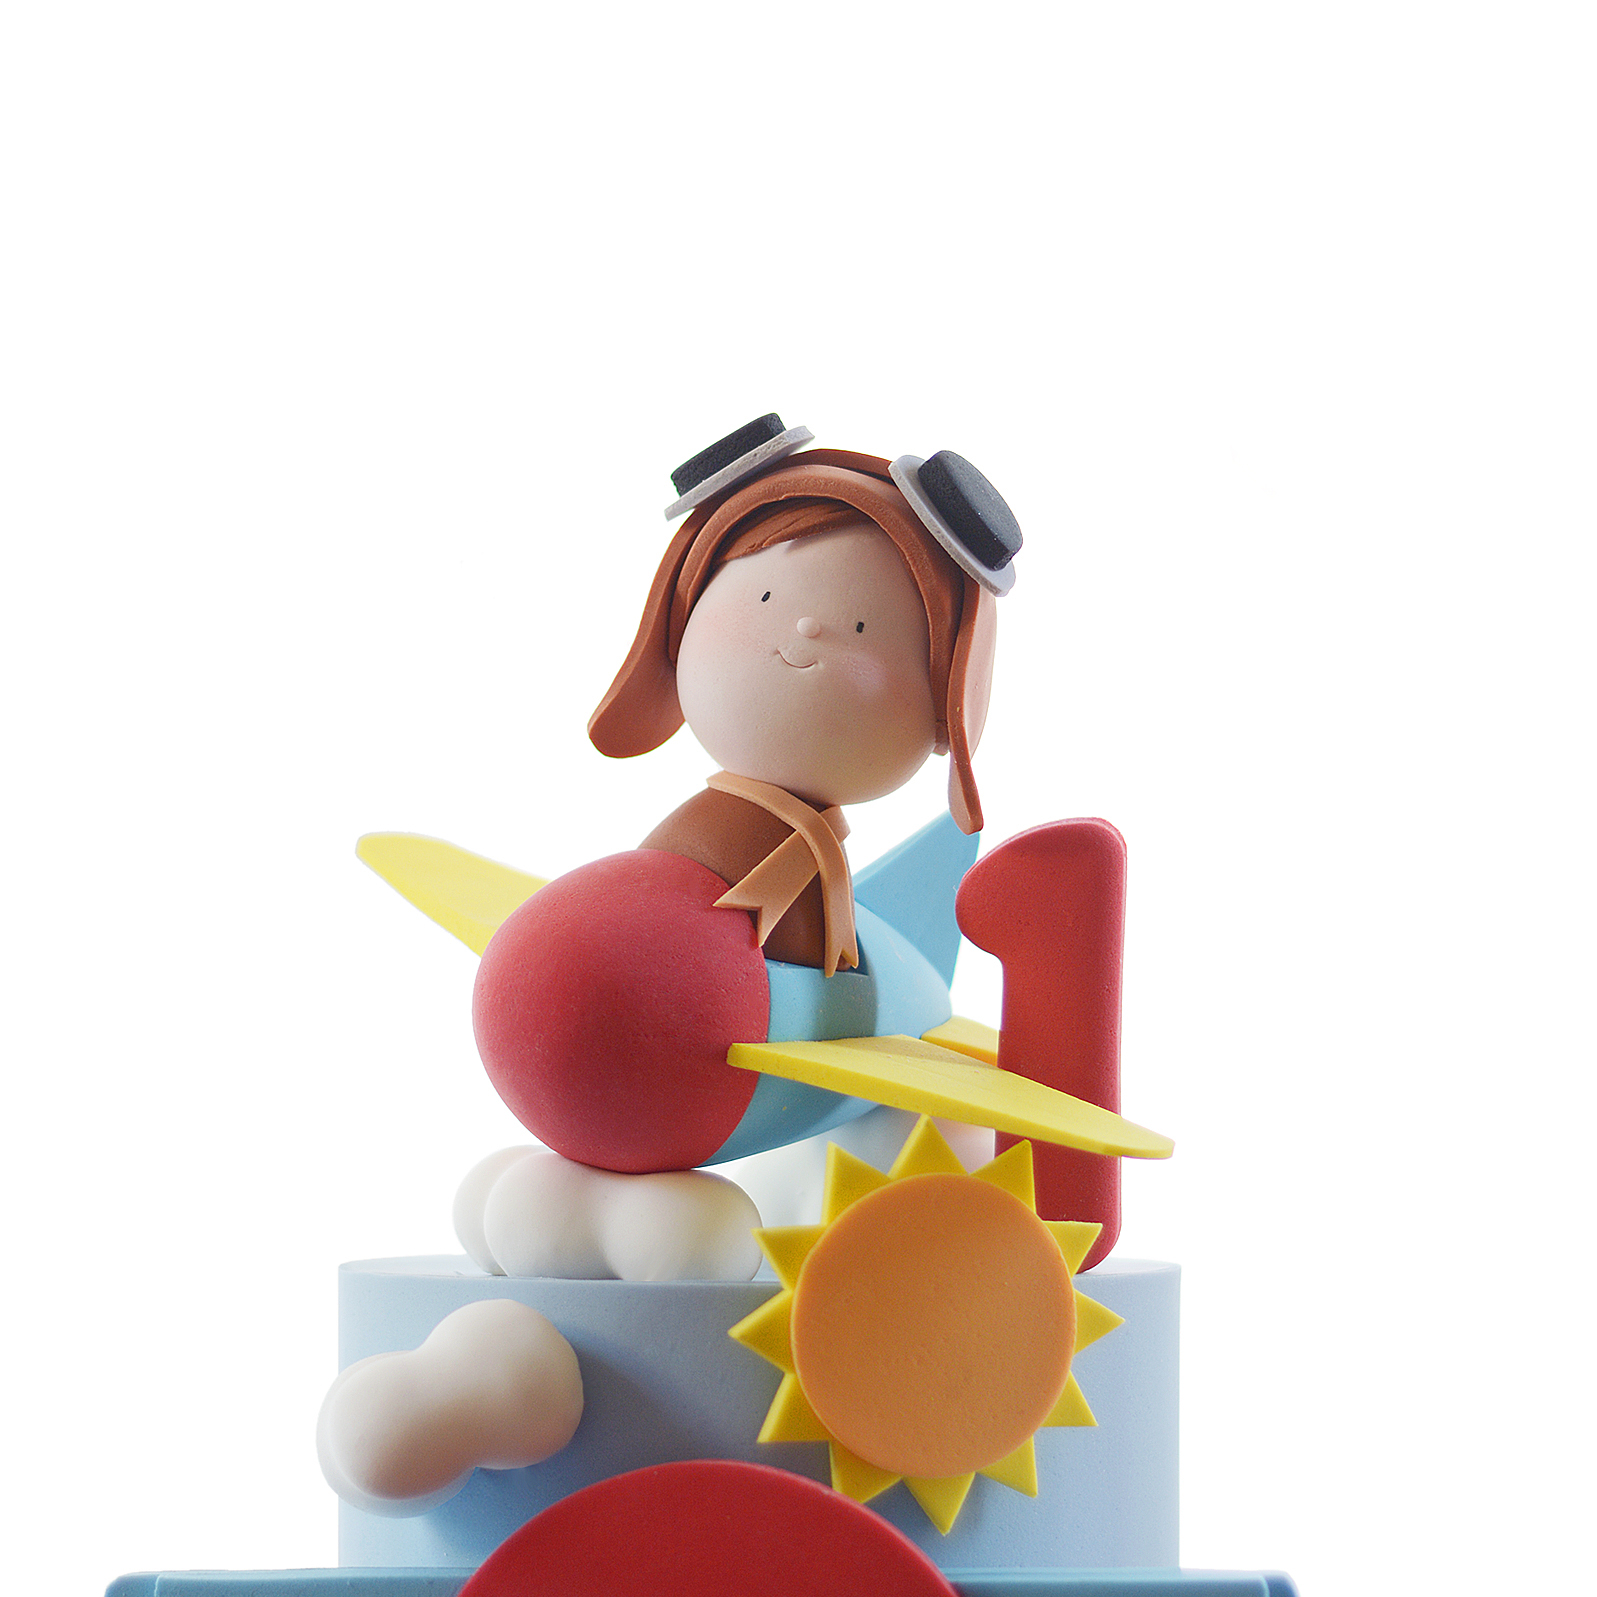 Airplane pilot fondant figurine